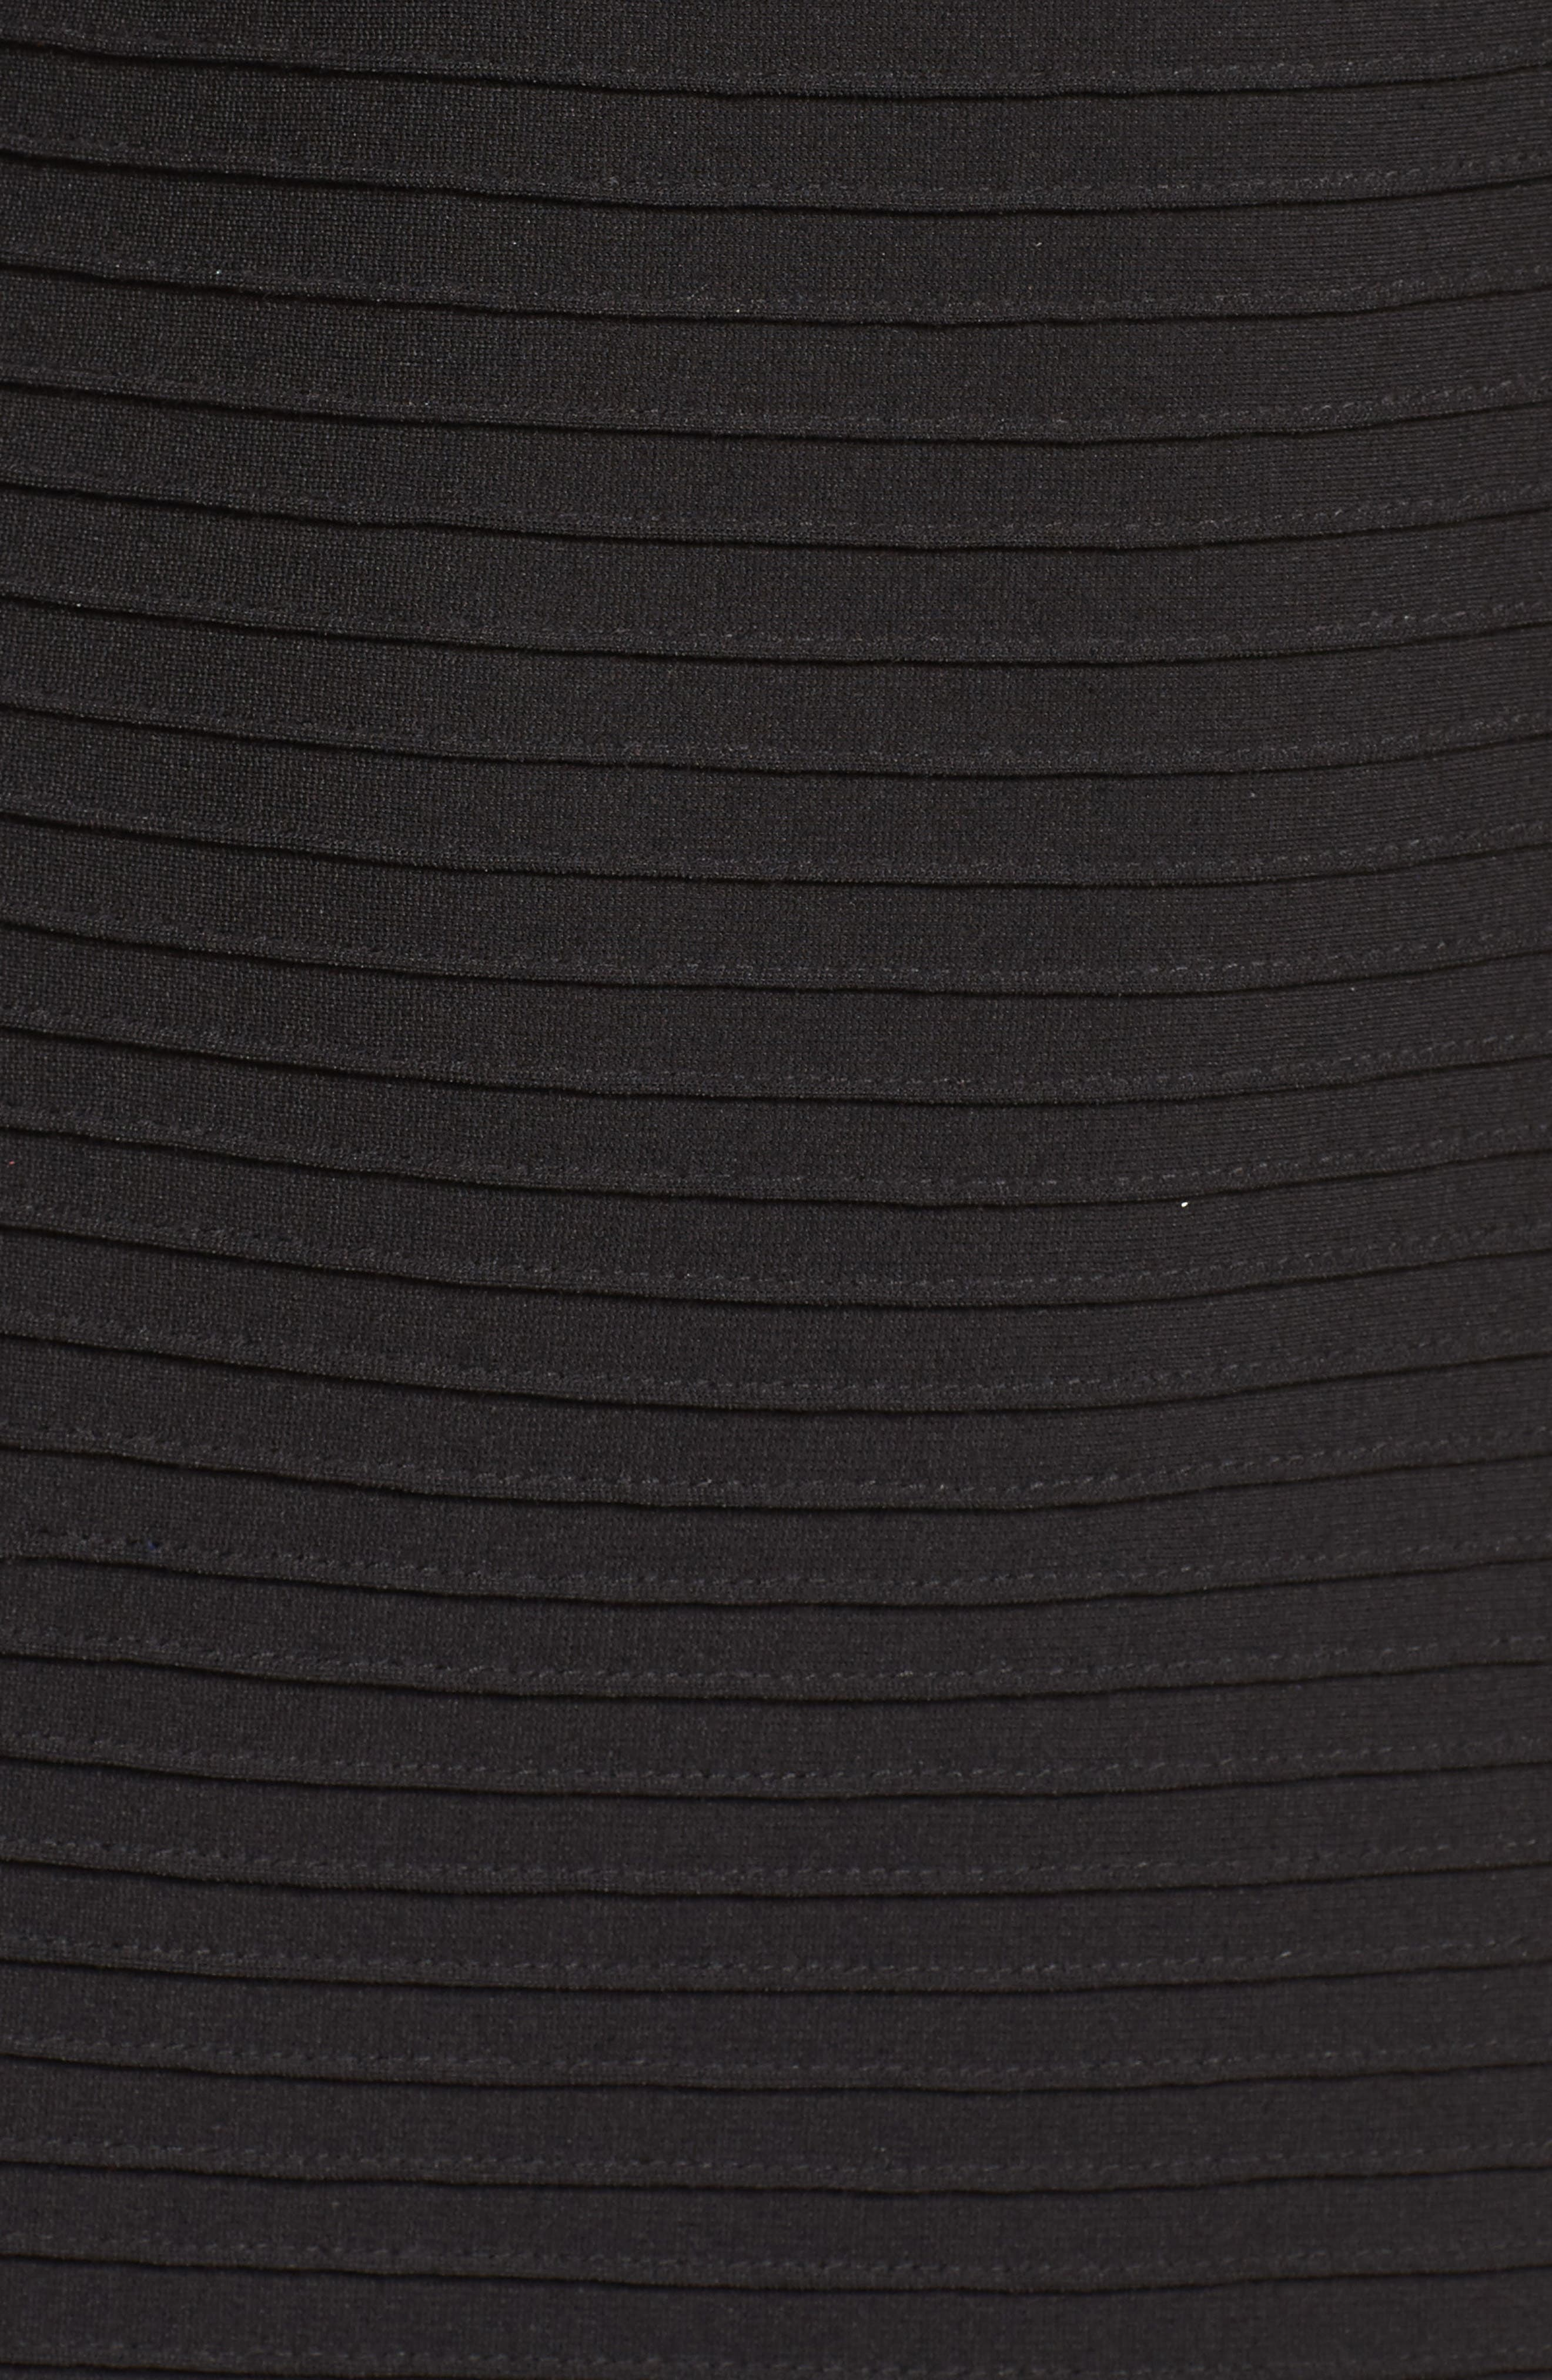 Mixed Media Sheath Dress,                             Alternate thumbnail 6, color,                             001